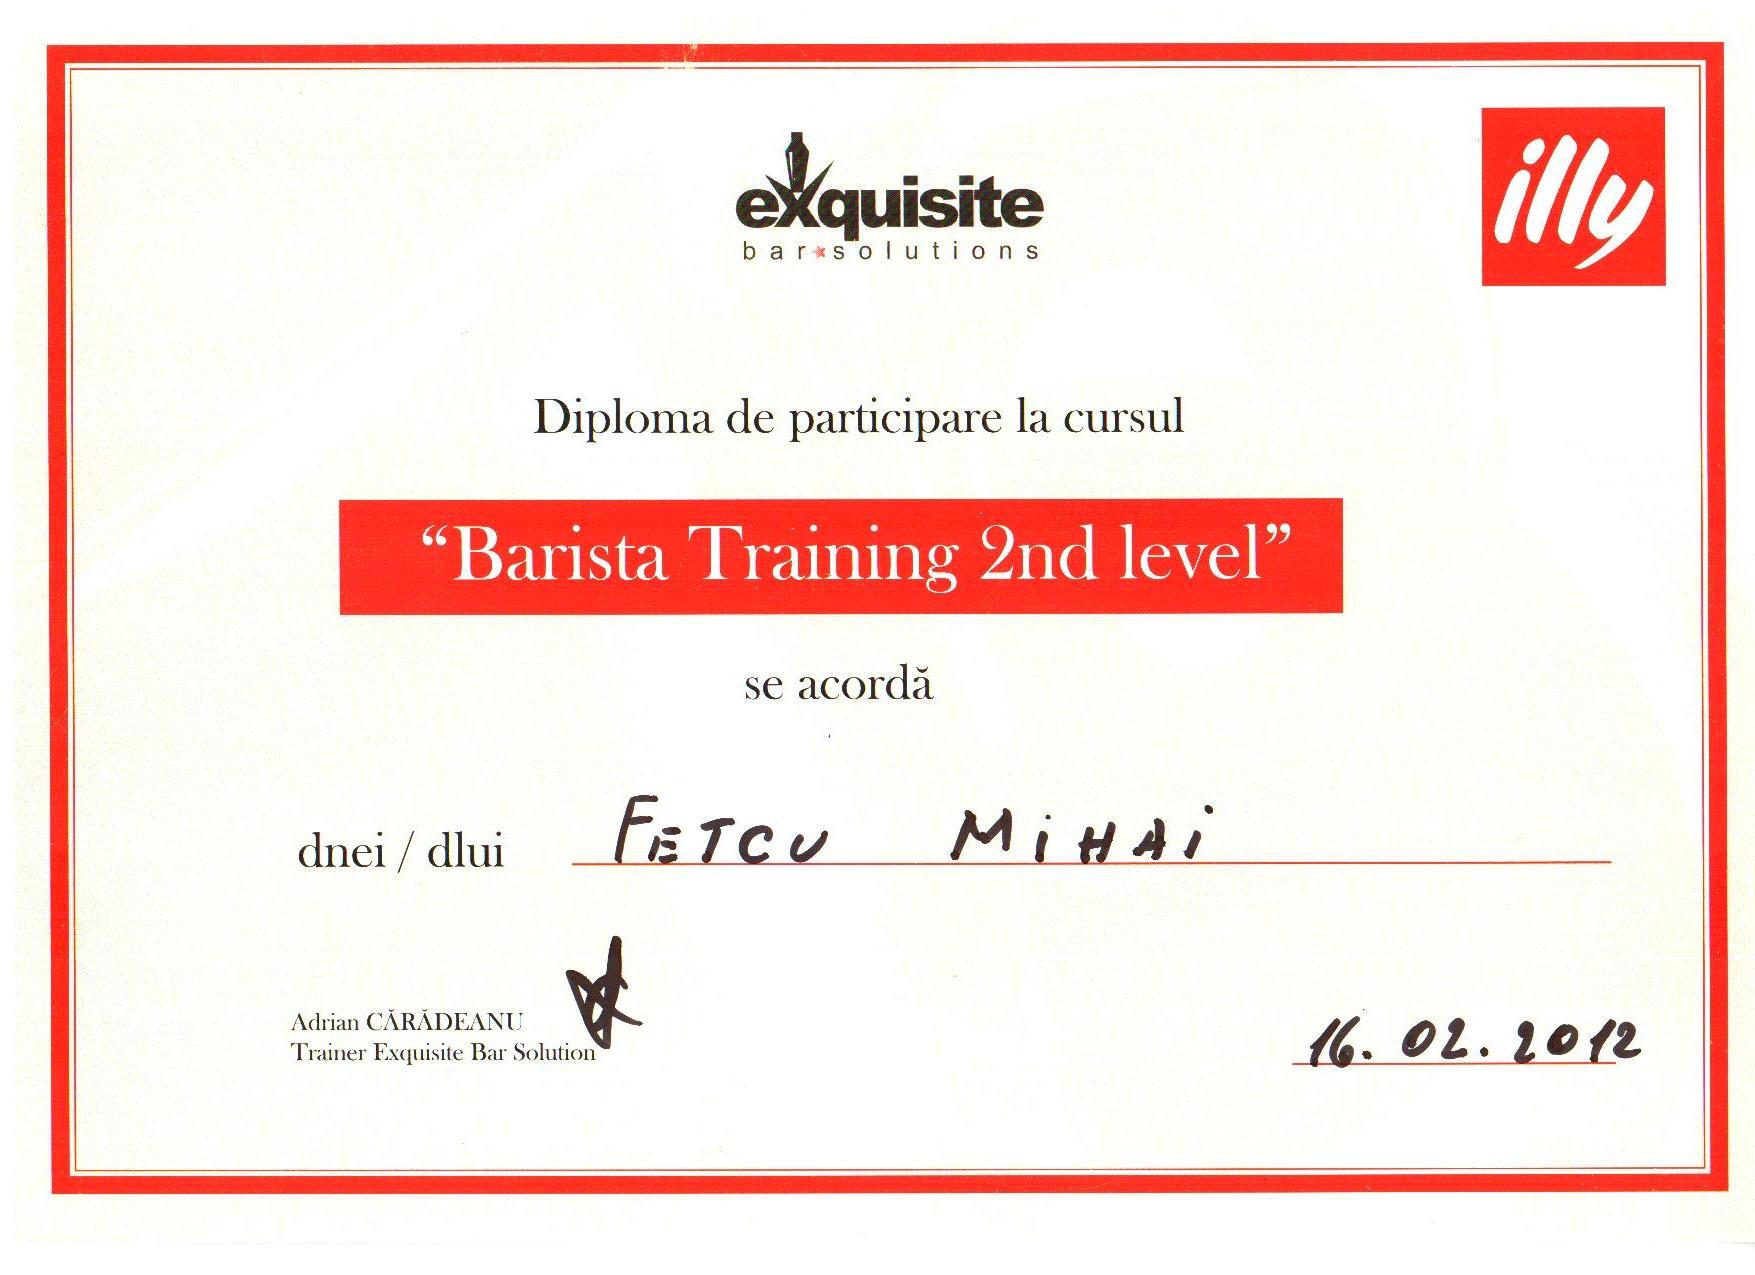 J_Barista training 2 nd level_2012